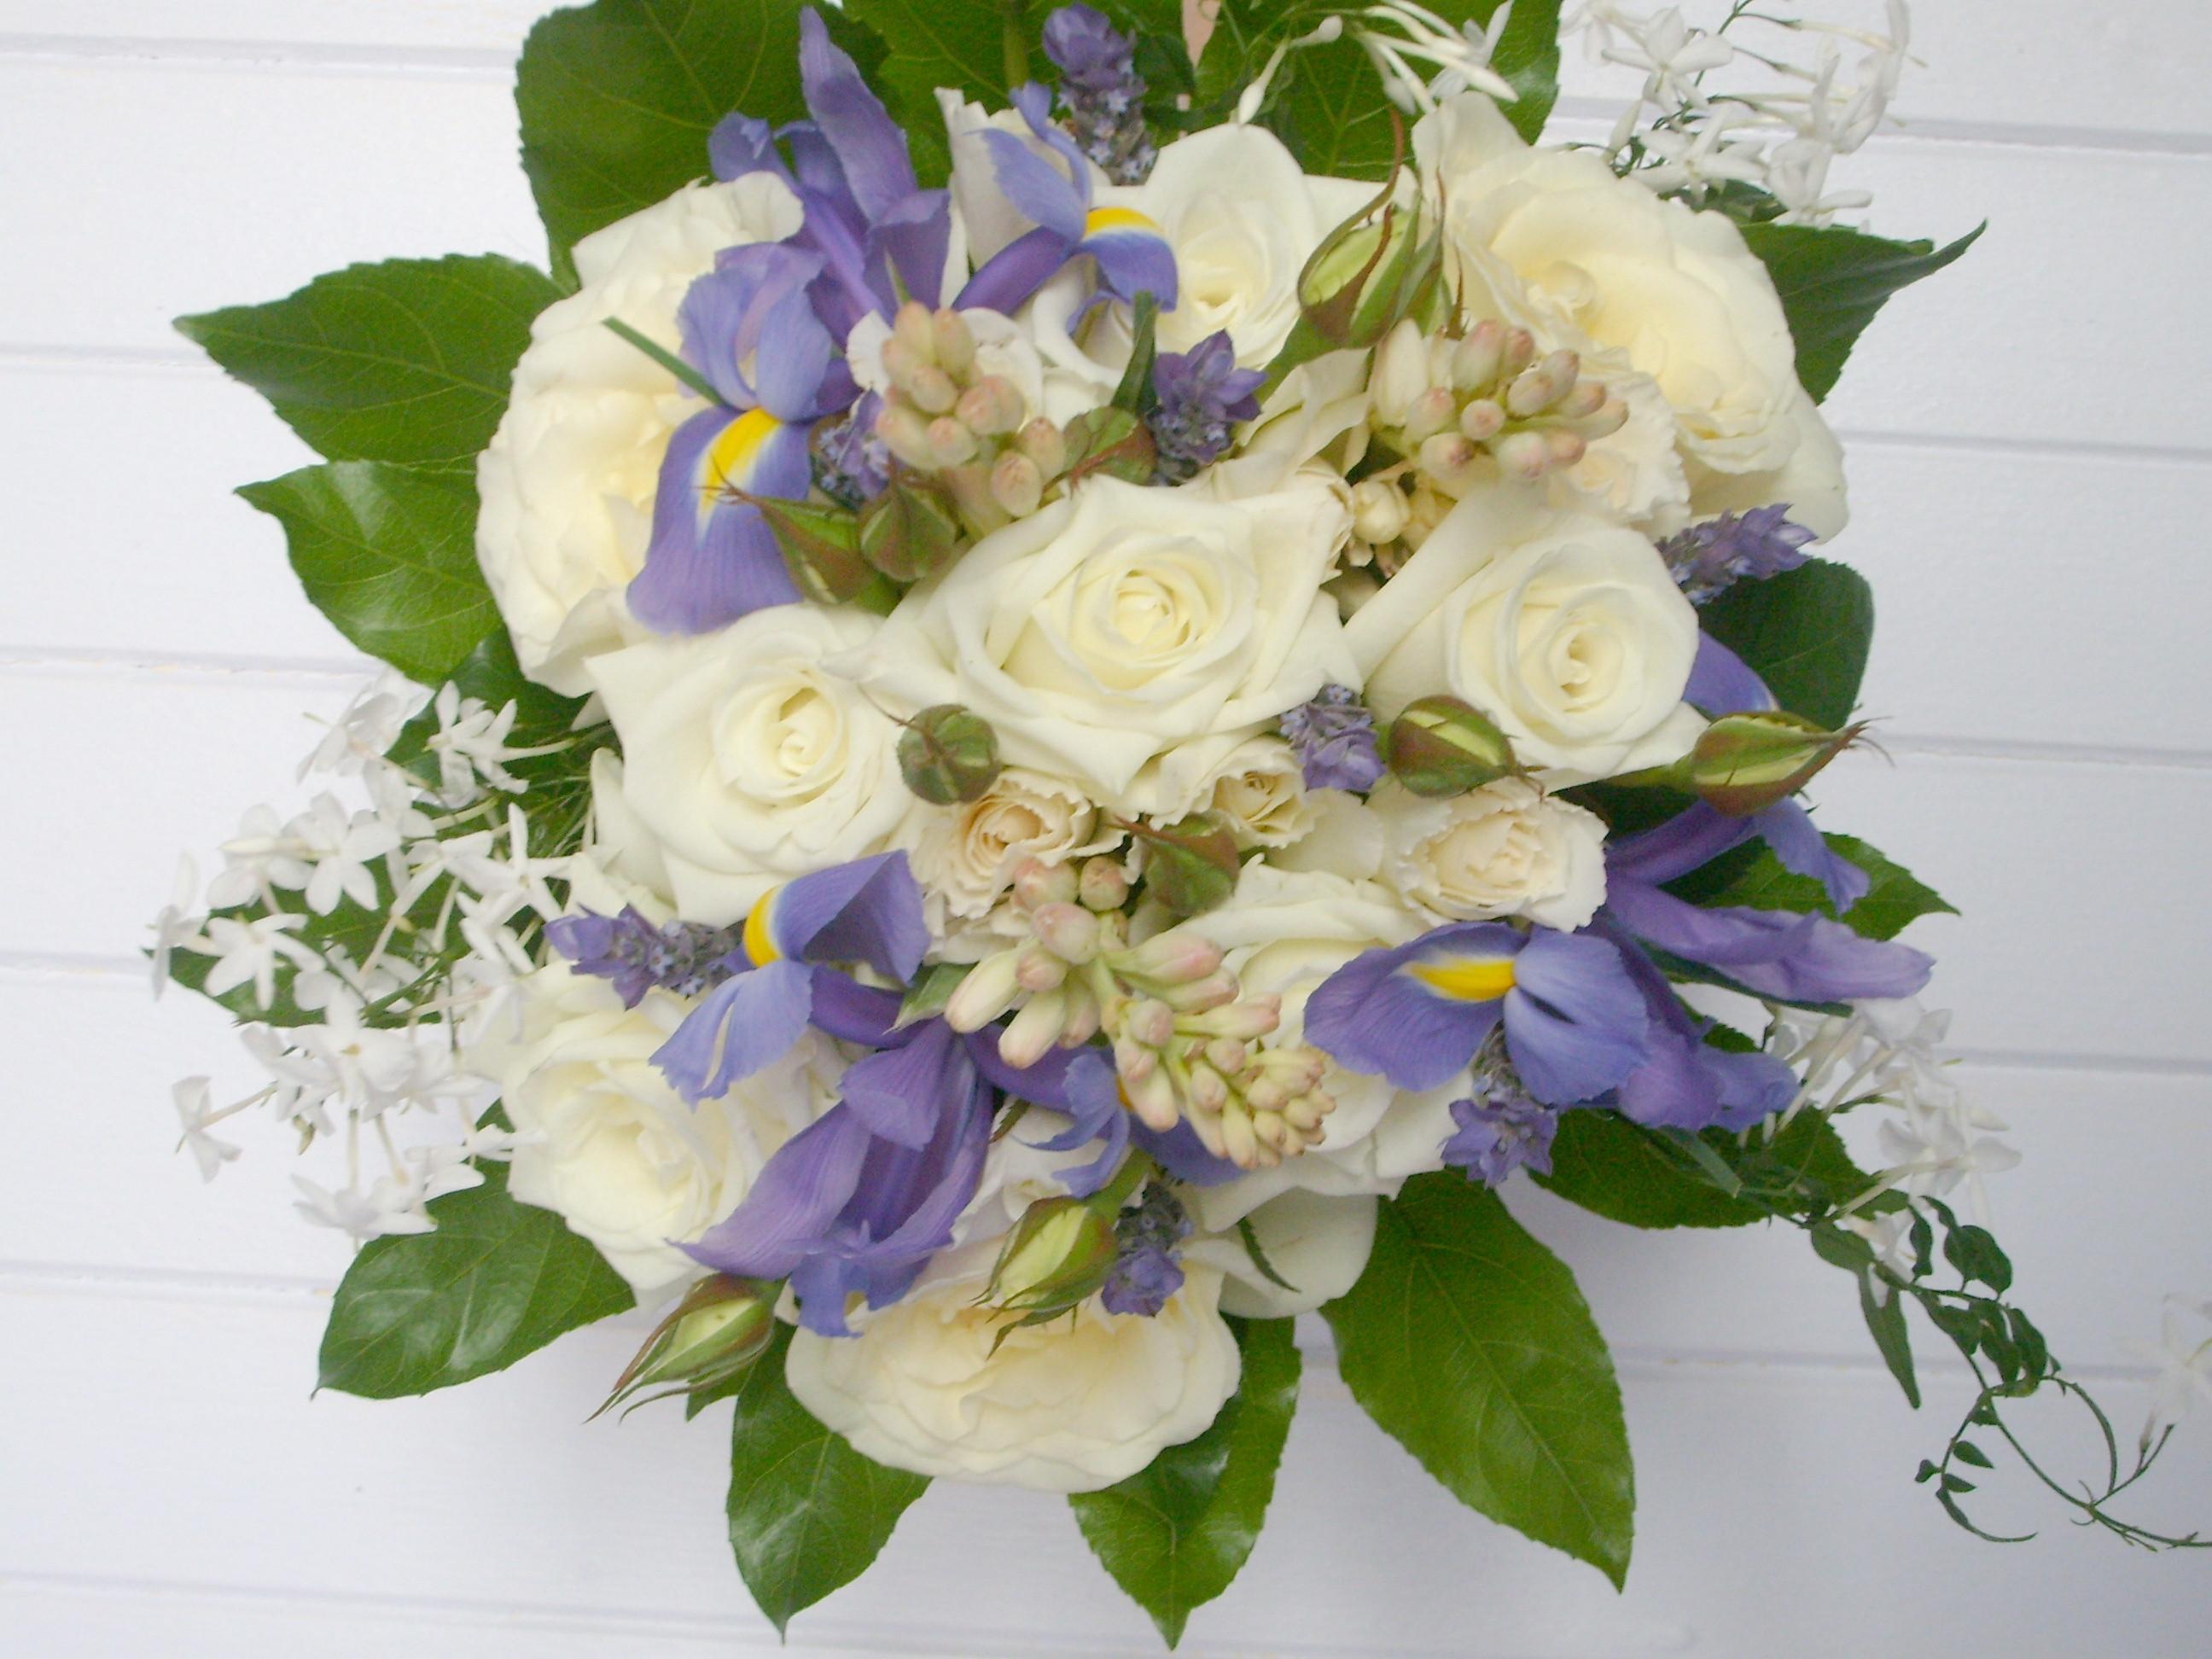 Wedding Flowers Ideas Luxury Cheap Wedding Flowers Bouquets Throughout Wedding Flowers A Bud Arranging Wedding